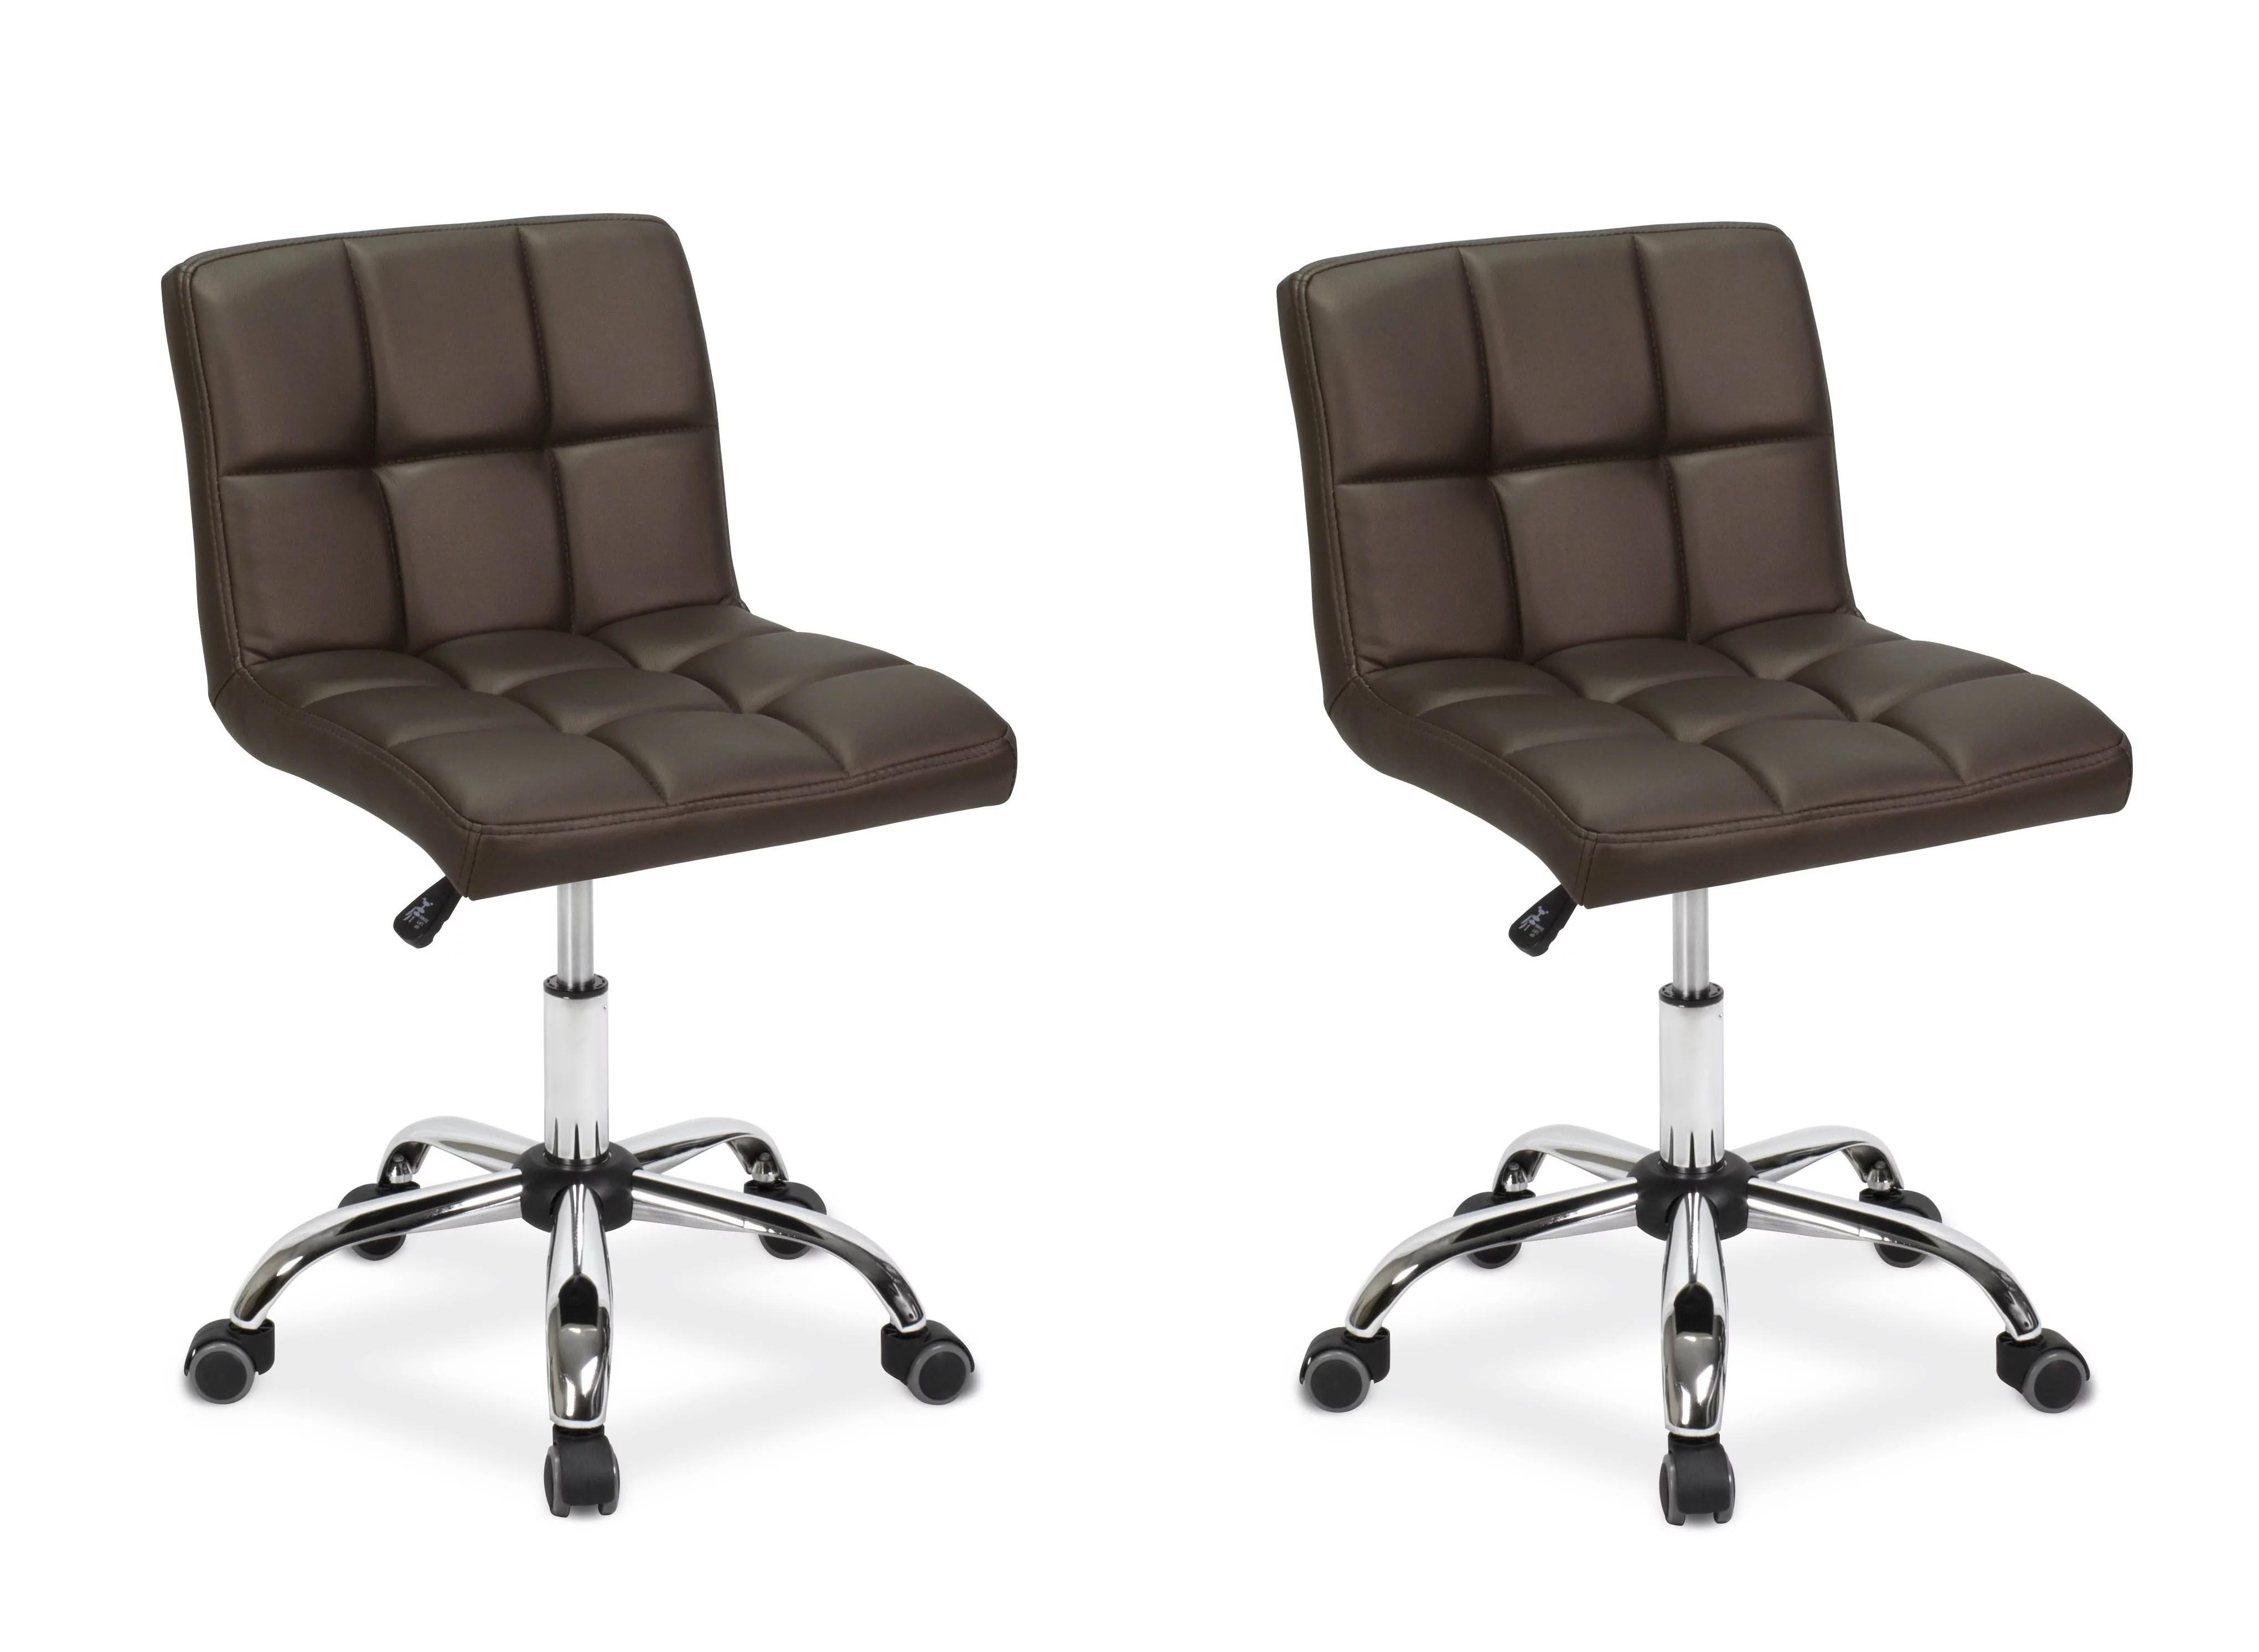 Esthetician Chair Technician Stool 2 TOTO COFFEE Pneumatic